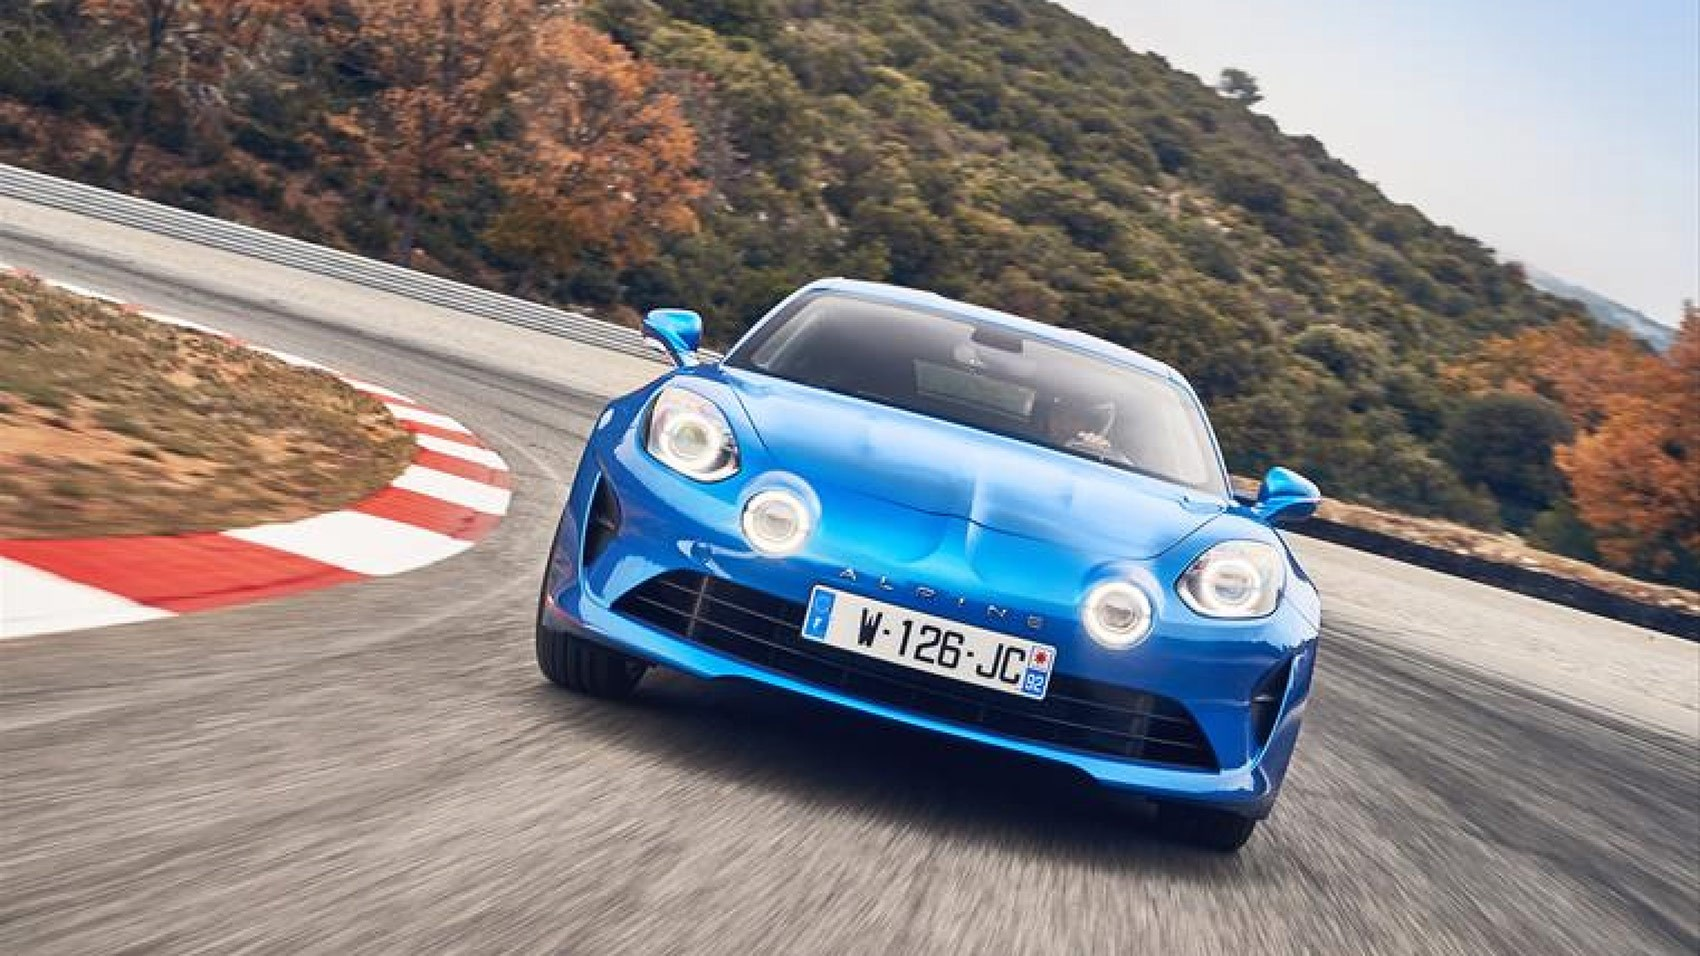 Alpine A110 track